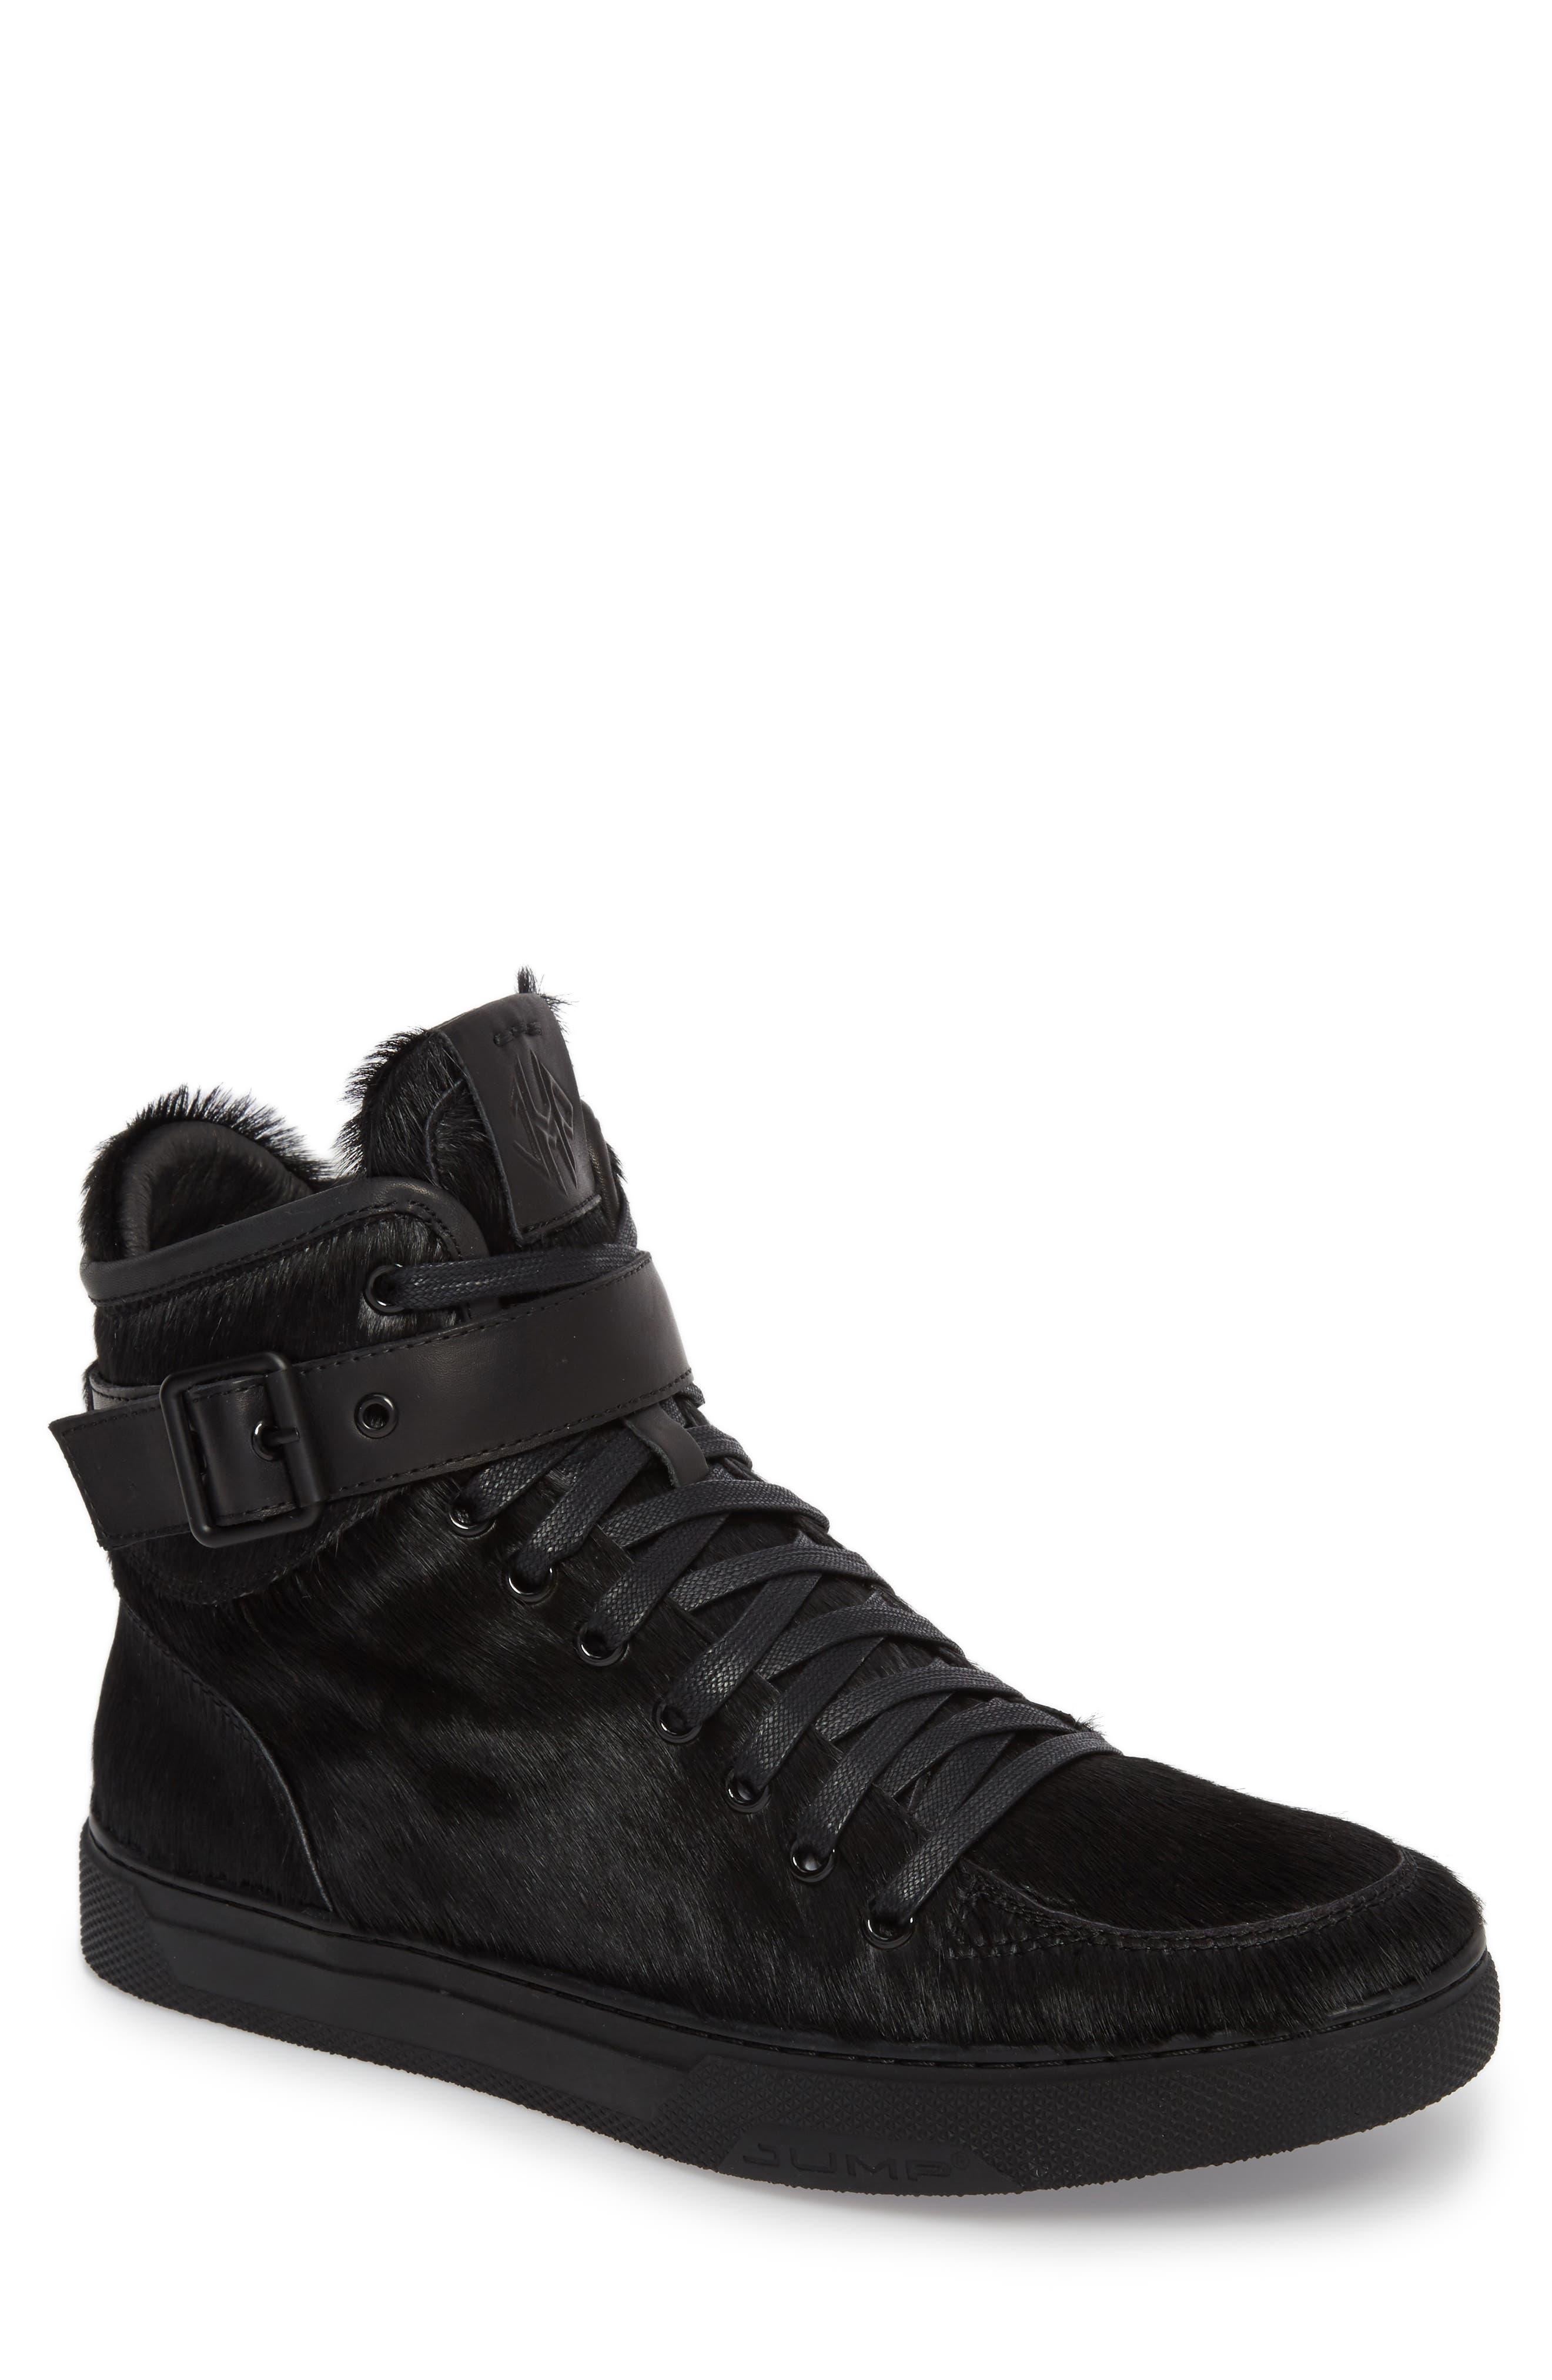 Sullivan Genuine Calf Hair High Top Sneaker,                             Main thumbnail 1, color,                             Black Fur Leather